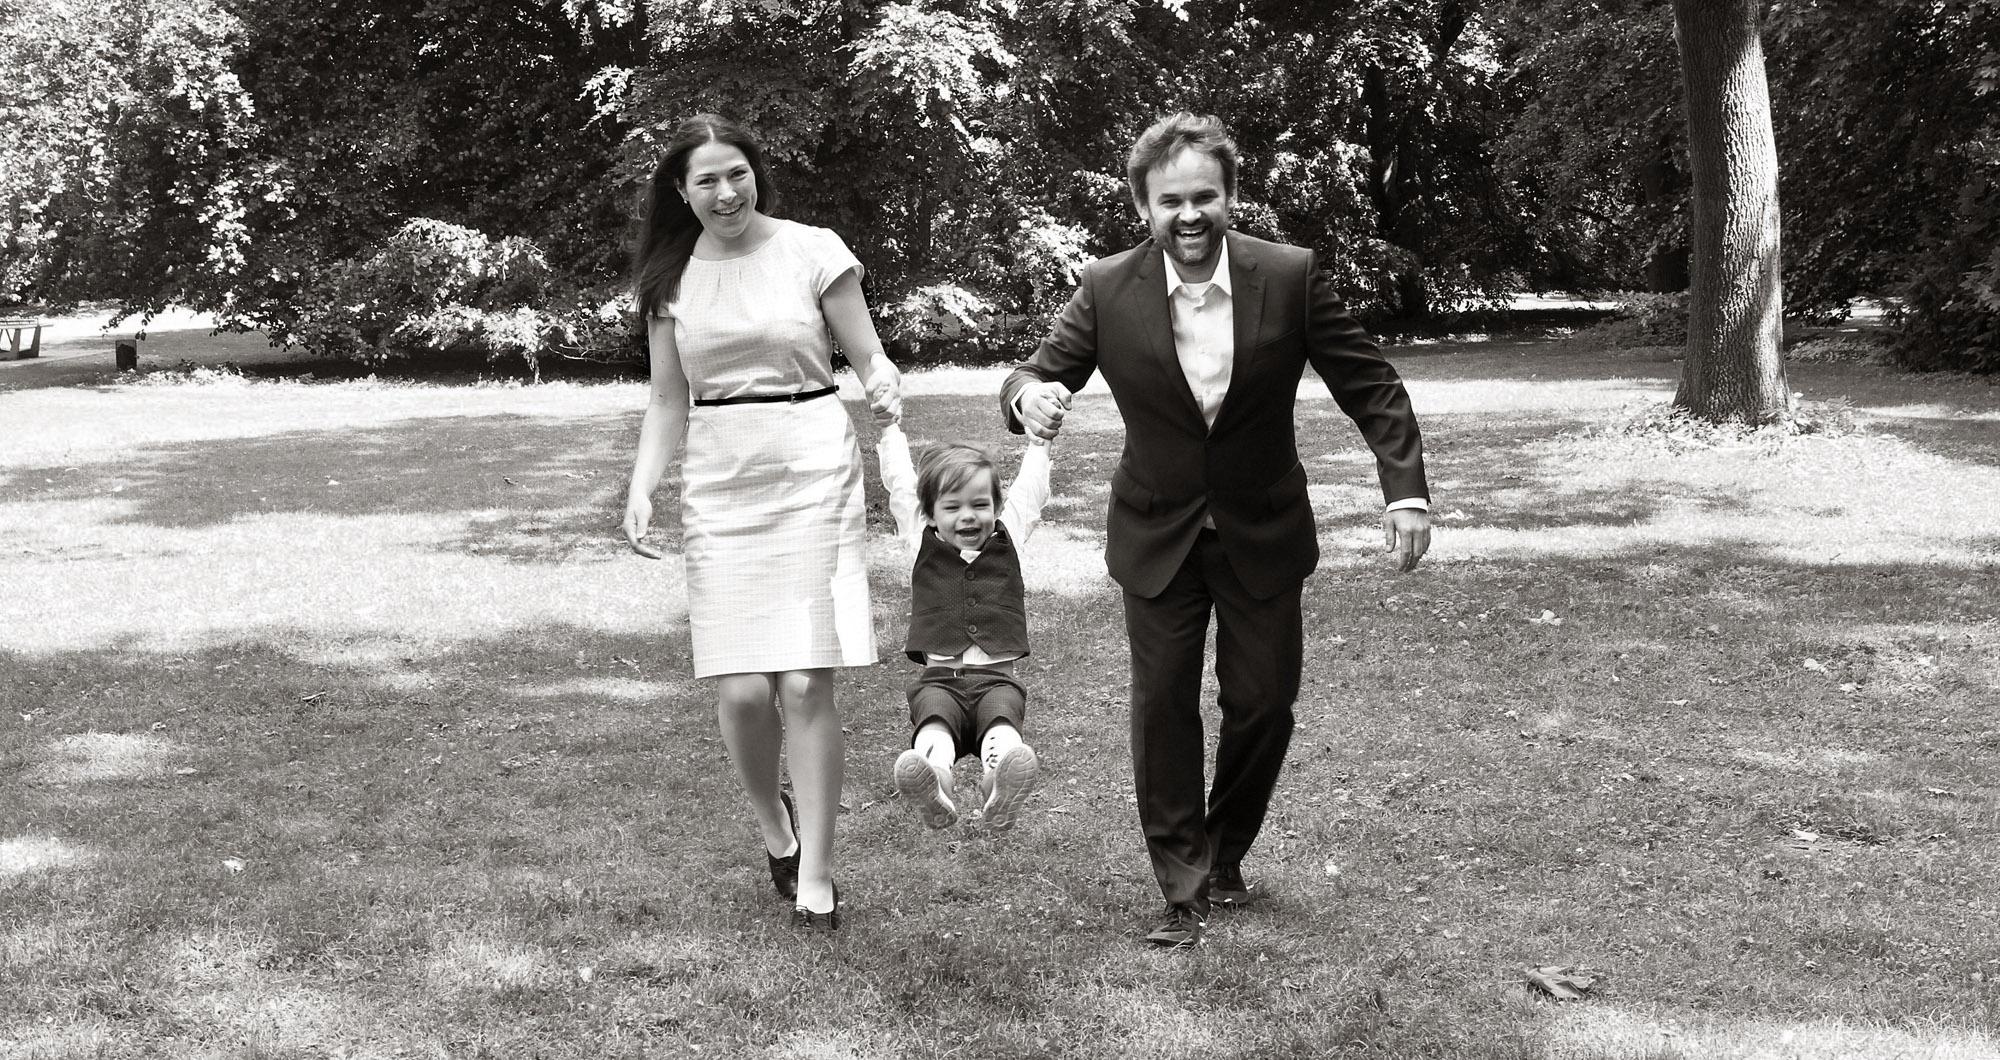 familieundkinderfoto-lenzvonkolkow-fotografie40